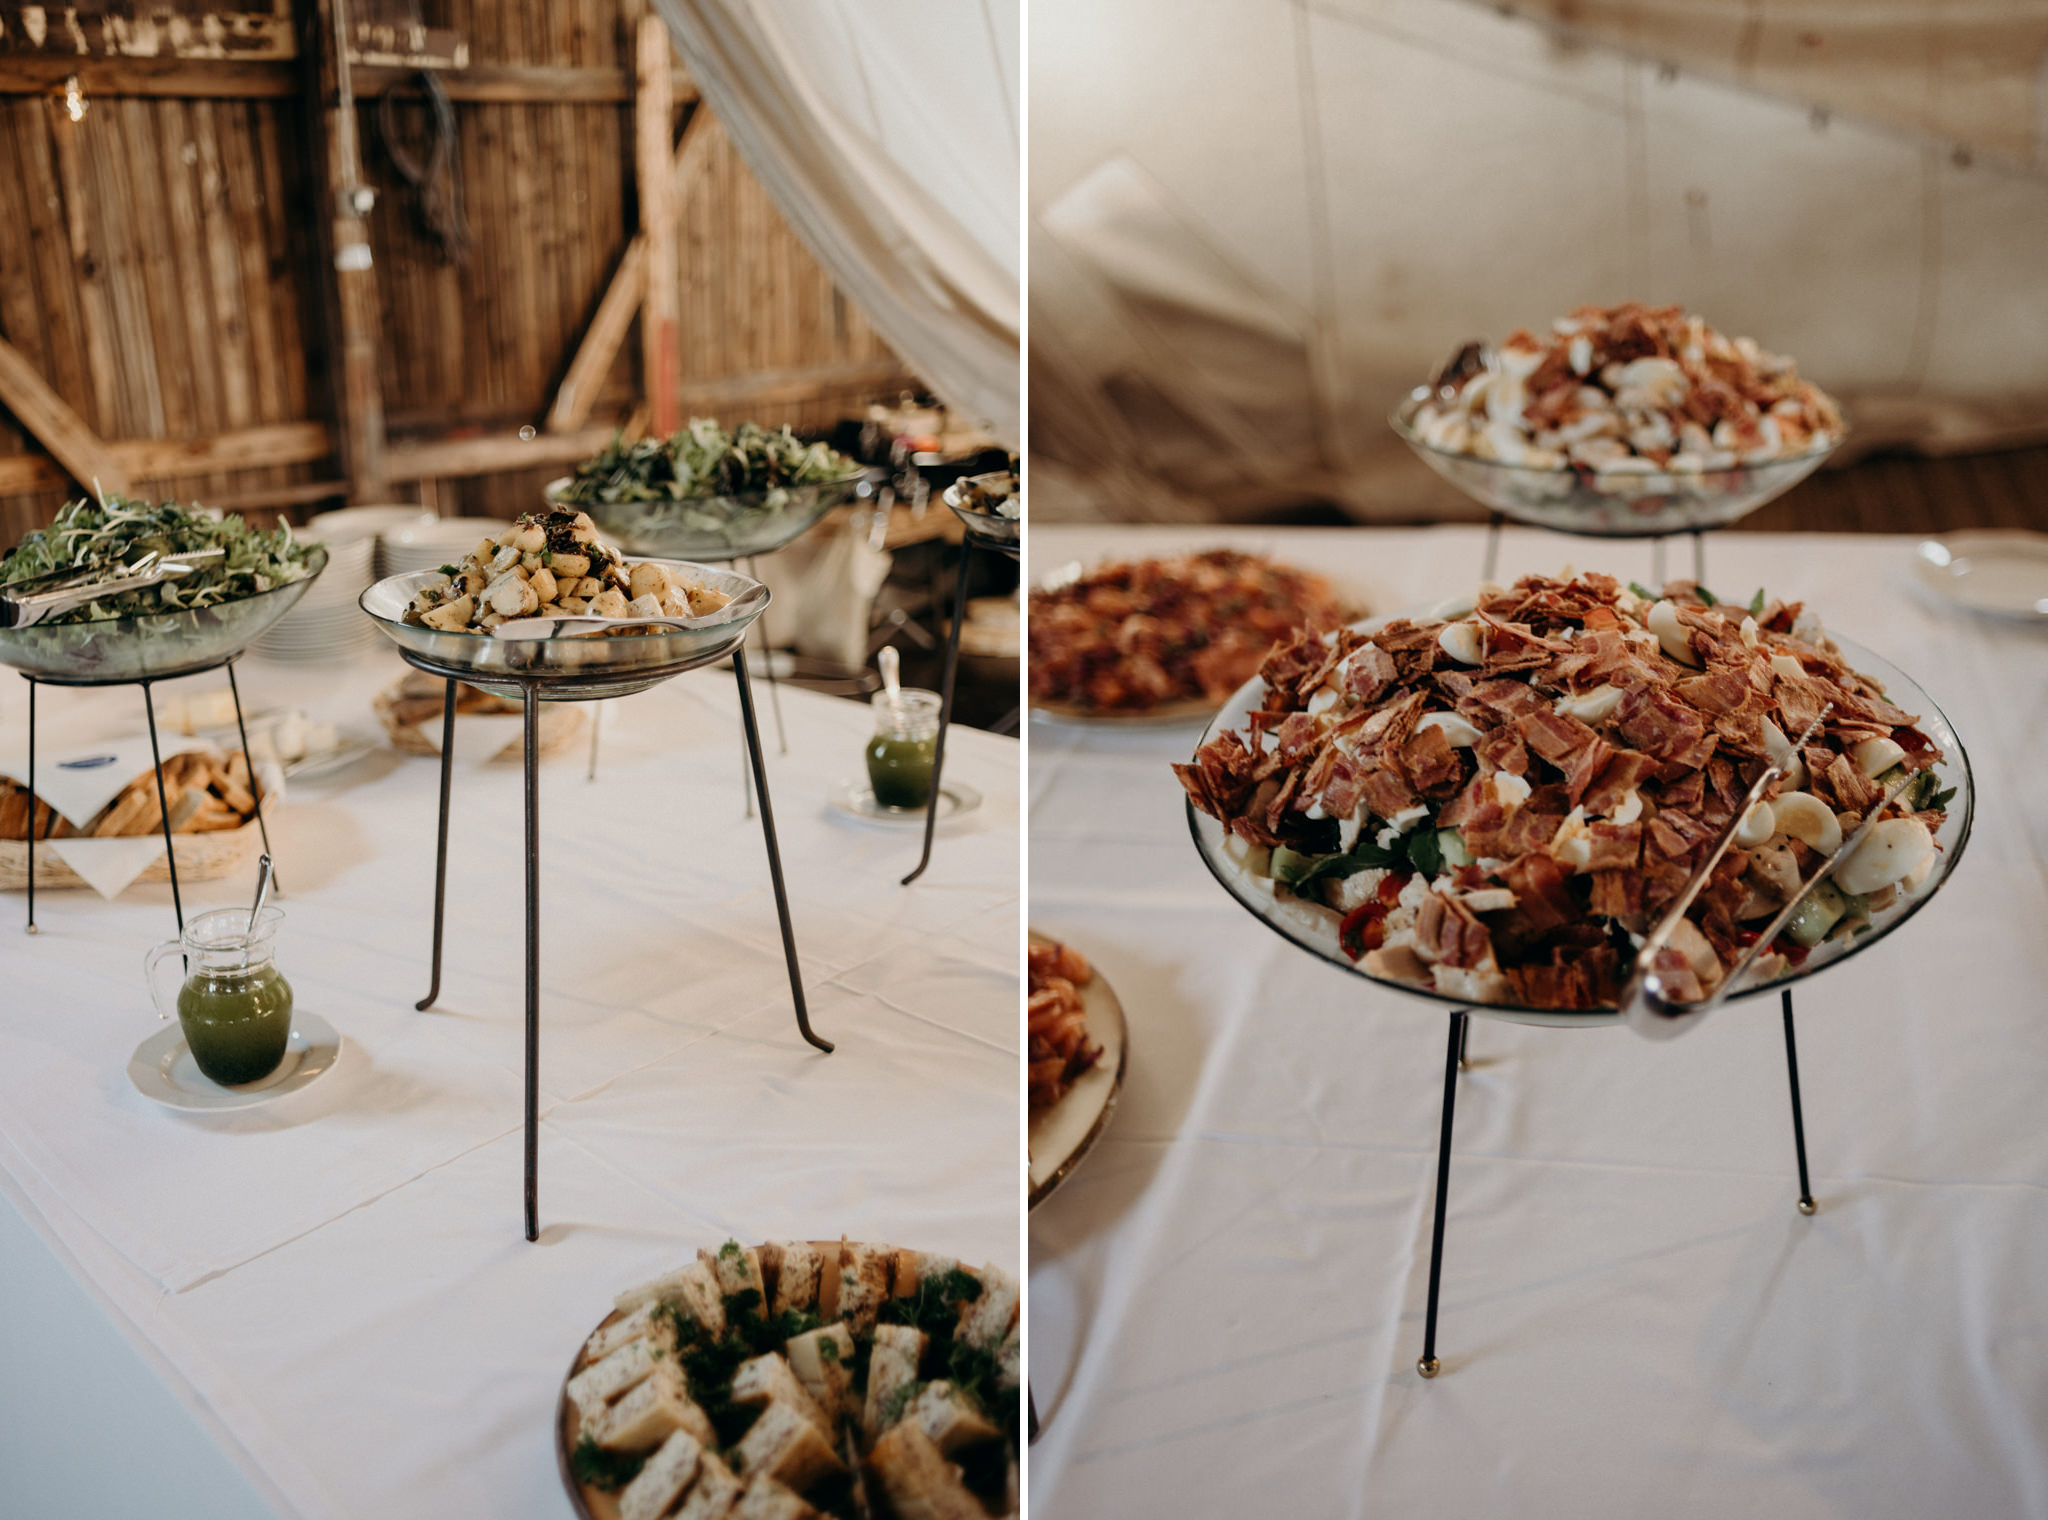 Guests drinking wine during speeches at Valkosaaren Telakka wedding reception